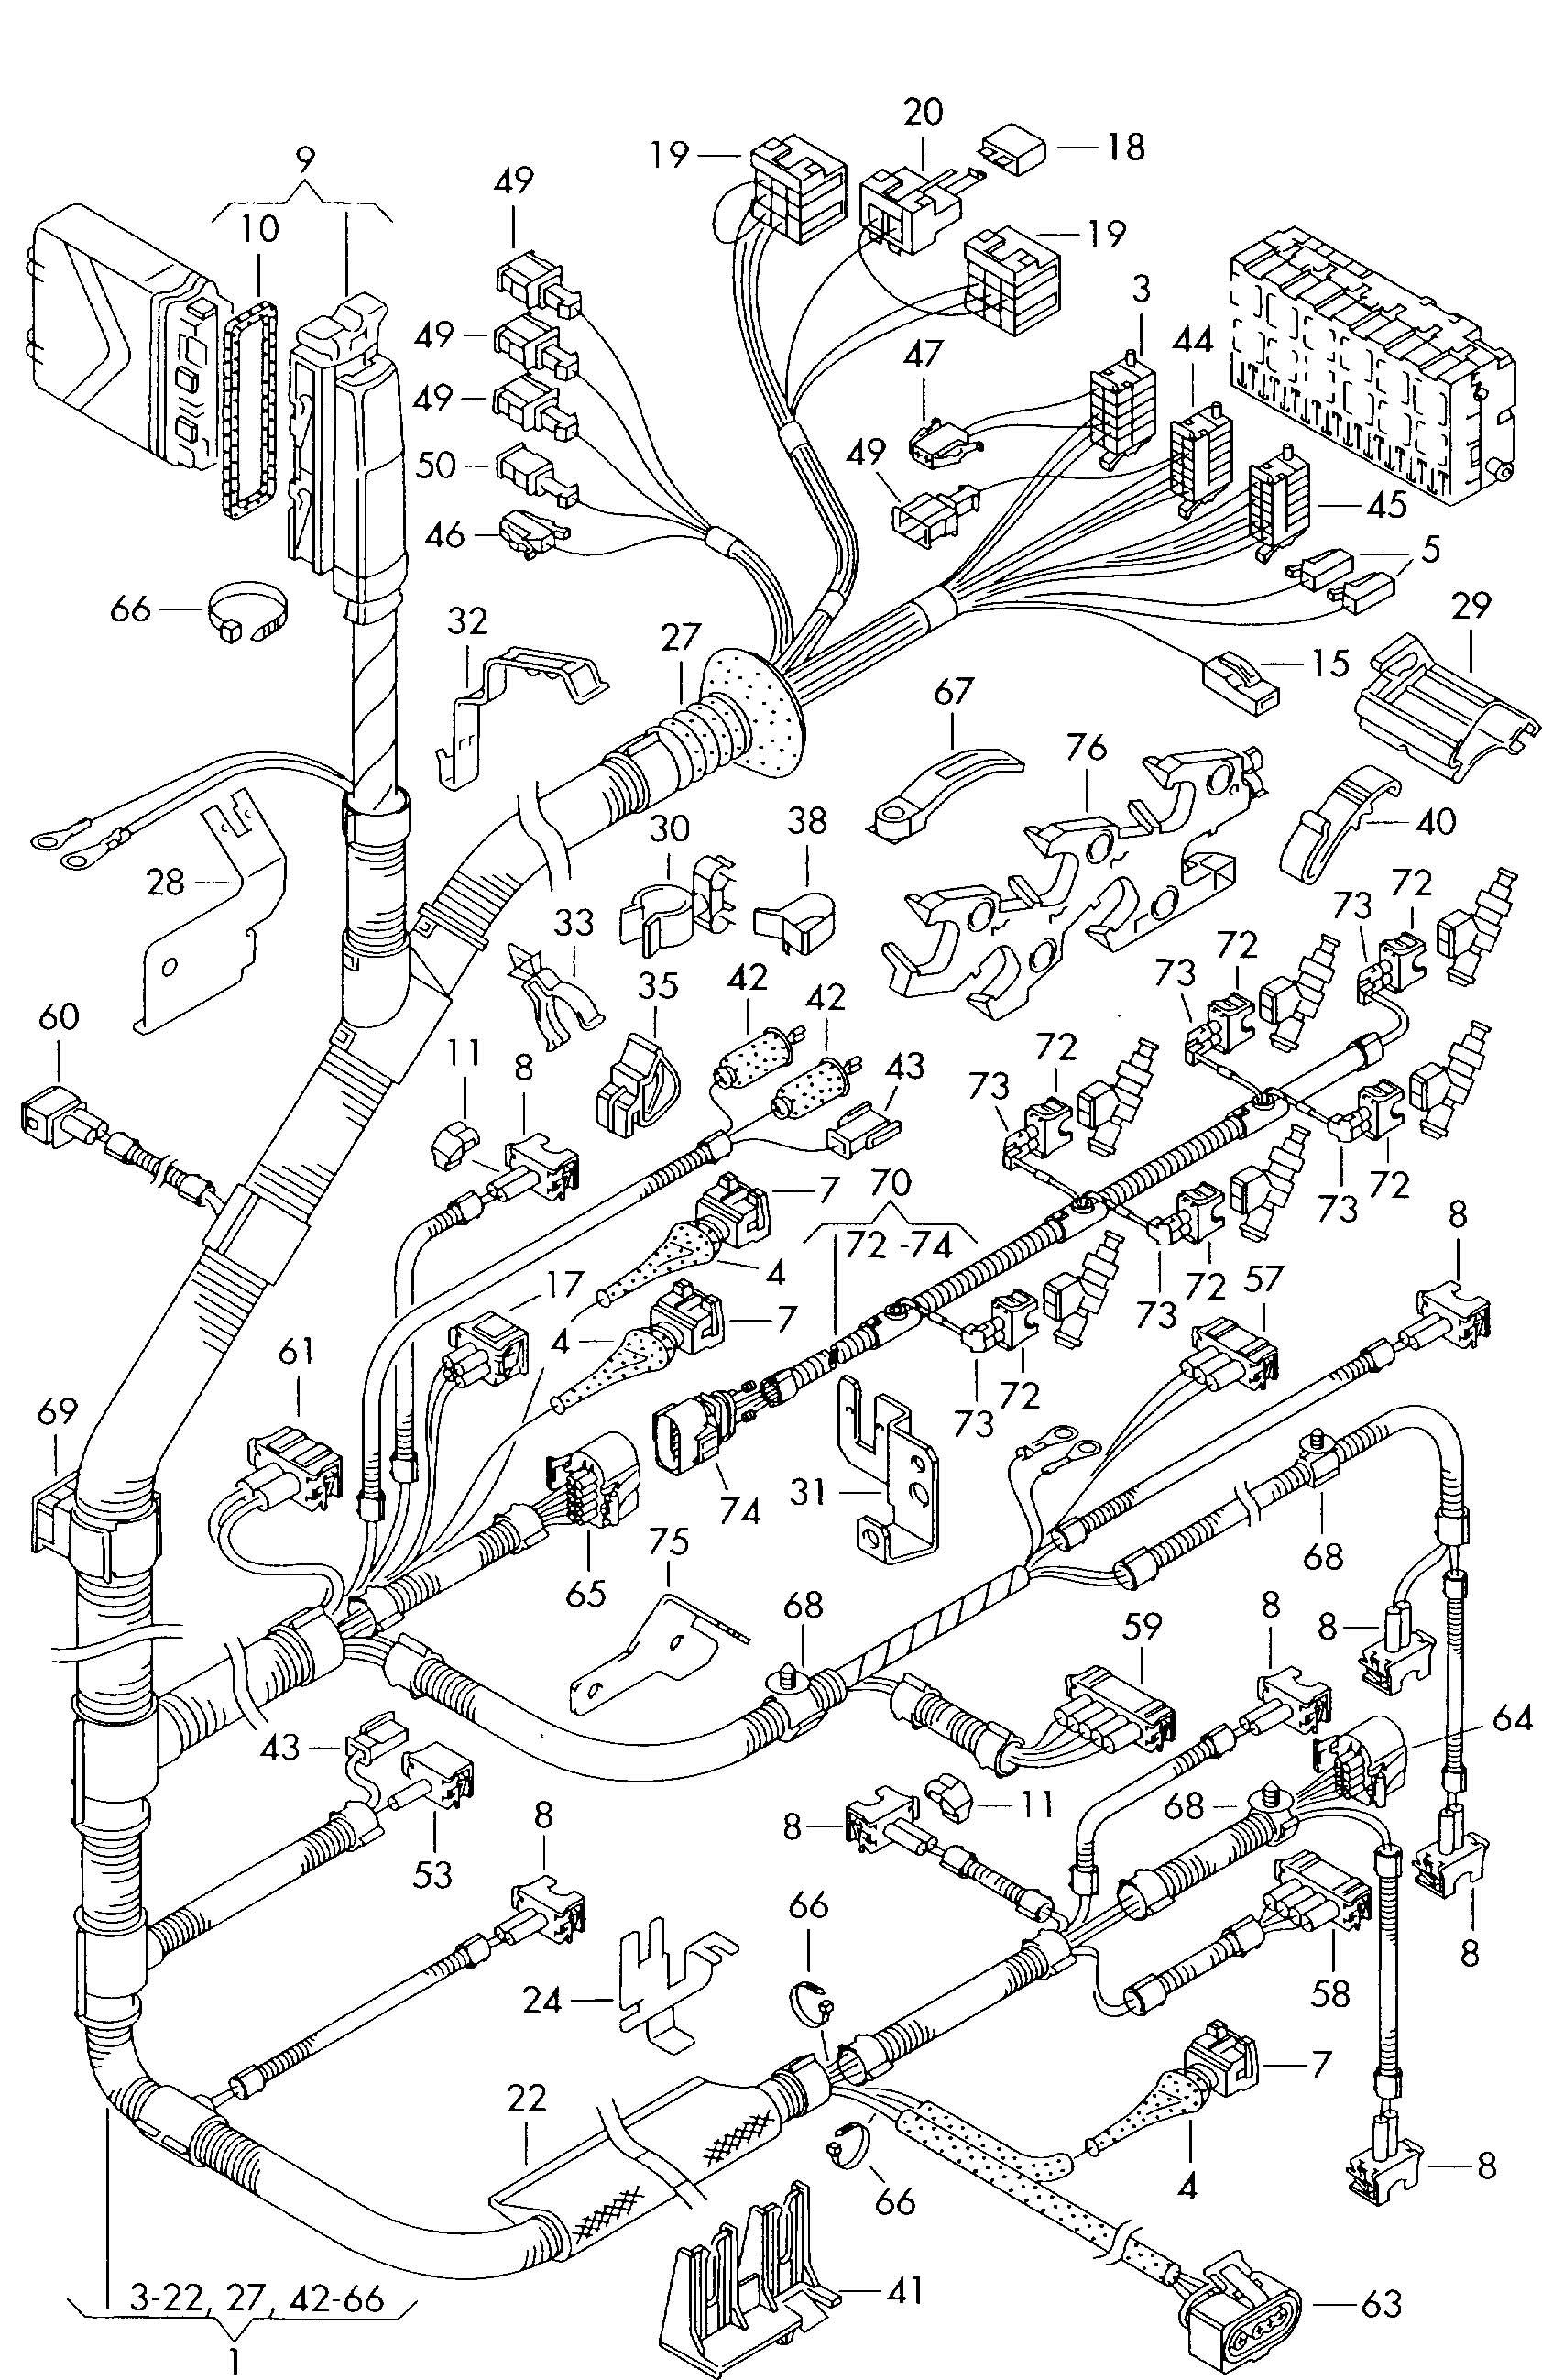 Vw Eurovan Wiring Diagram